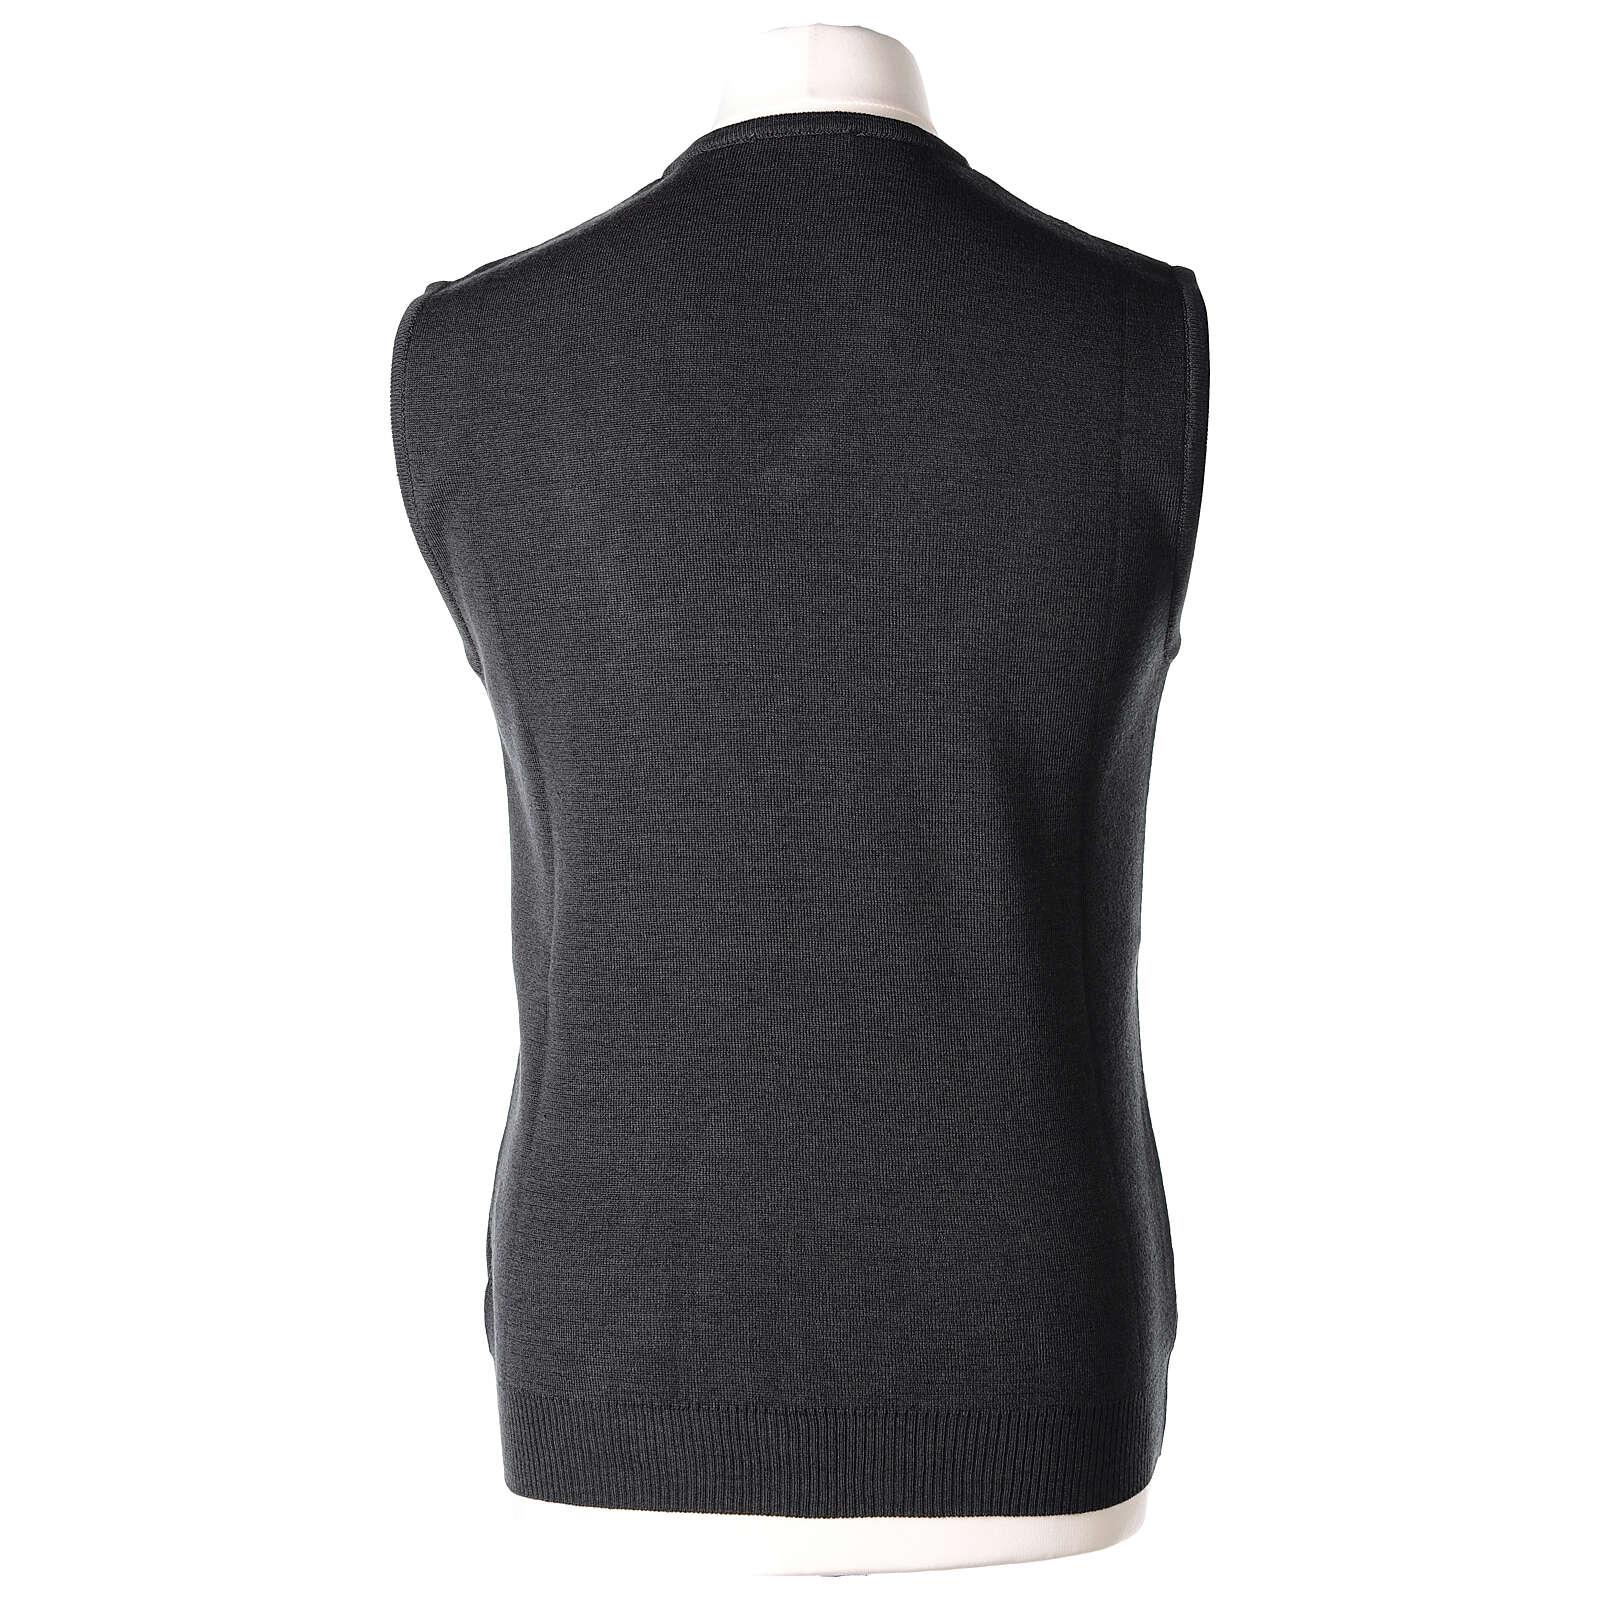 Colete de sacerdote antracite em tricô plano 50% lã de merino 50% acrílico In Primis 4